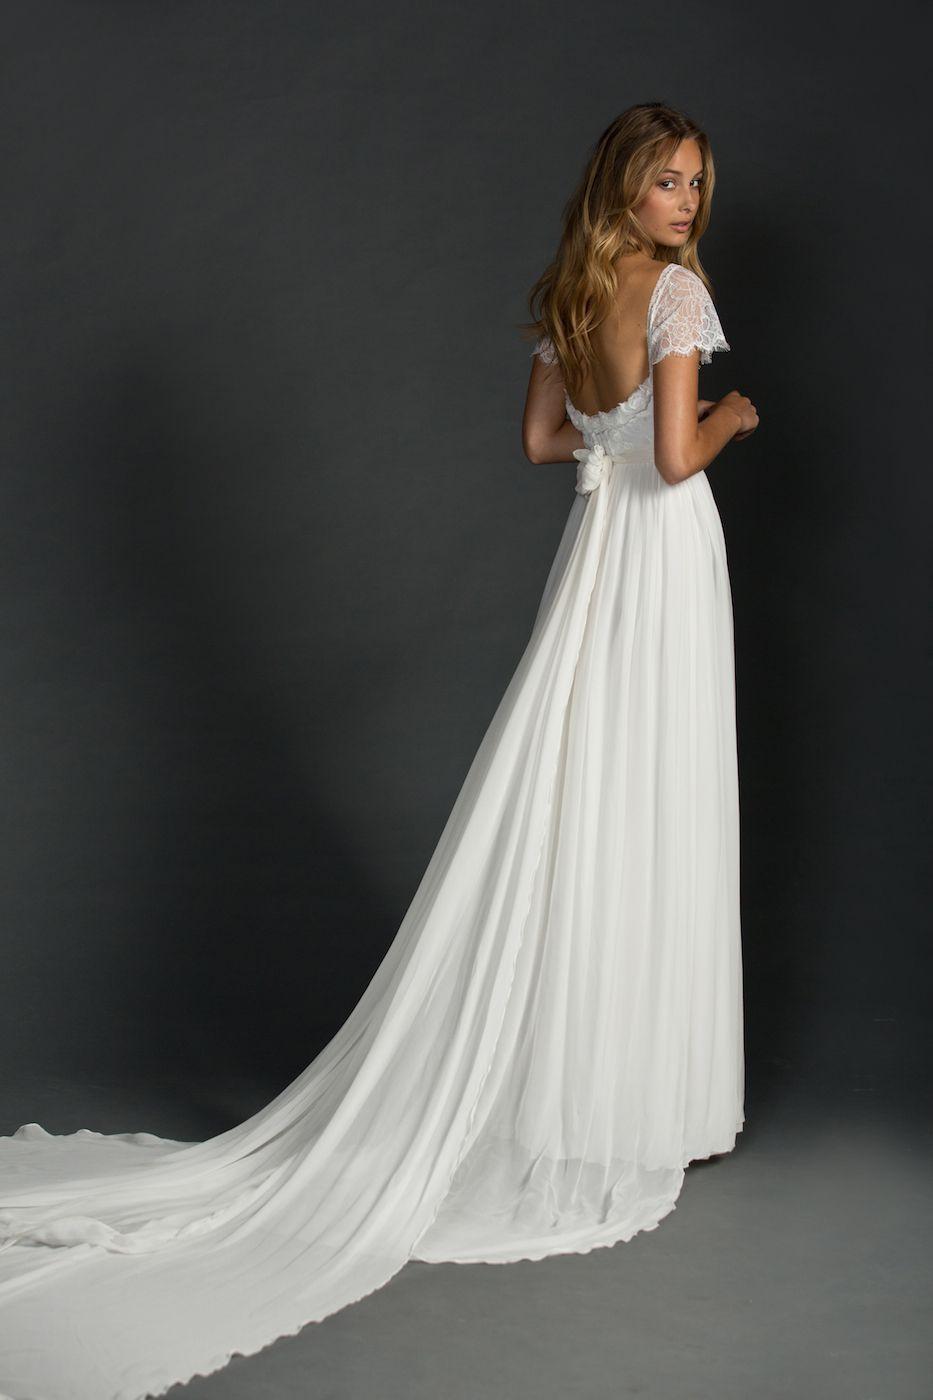 Nice Rock And Roll Wedding Dresses Photos - Wedding Dress Ideas ...